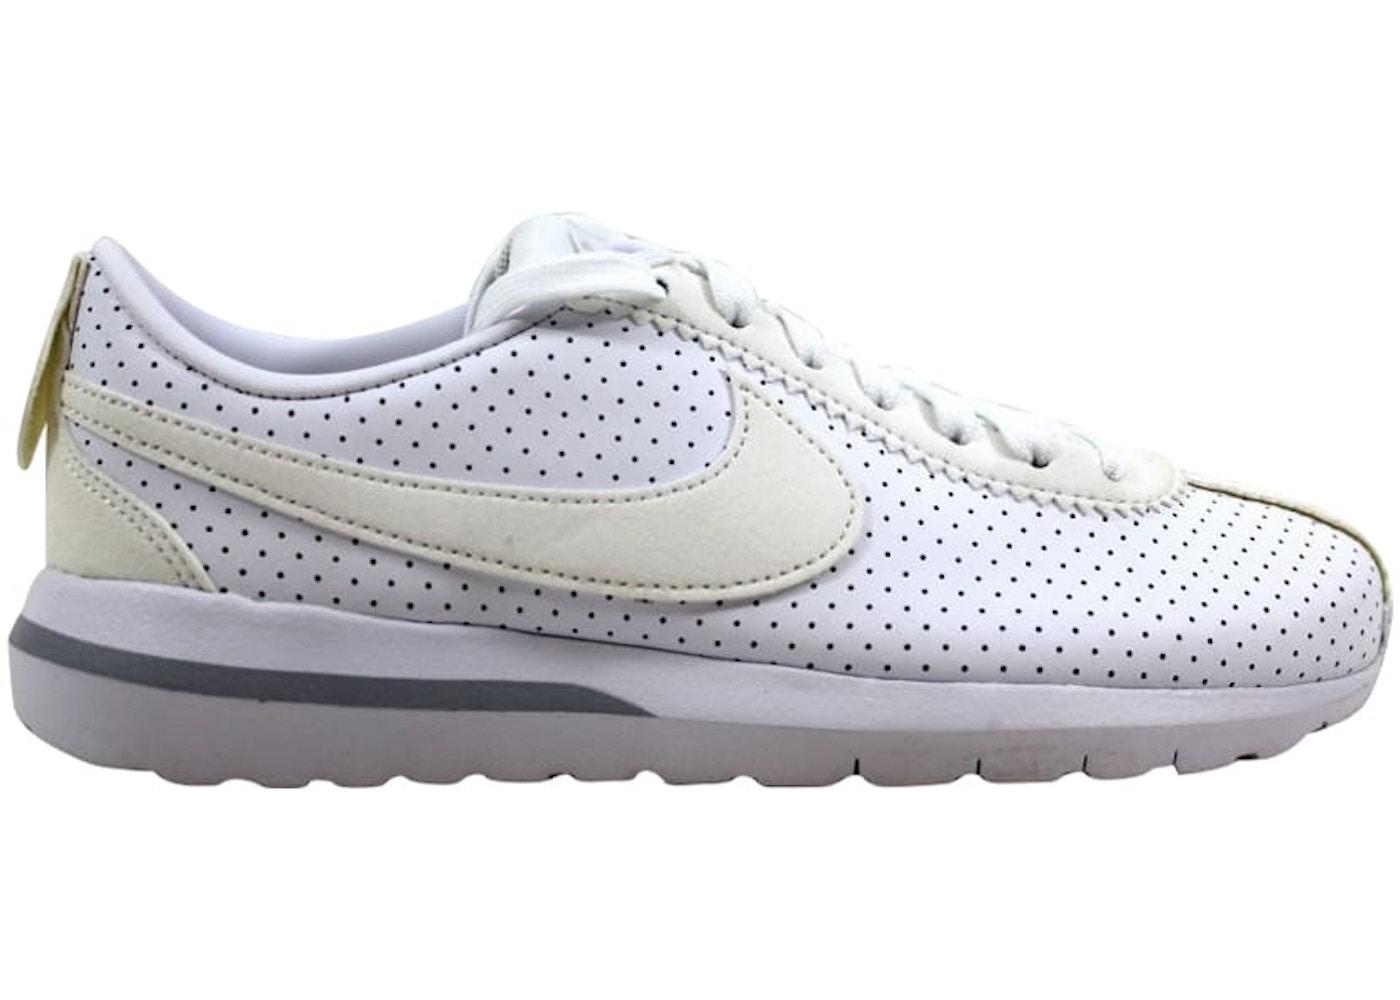 the latest 28ba8 f63a4 Nike Roshe Cortez NM White White-Pure Platinum (W) - 833804-101